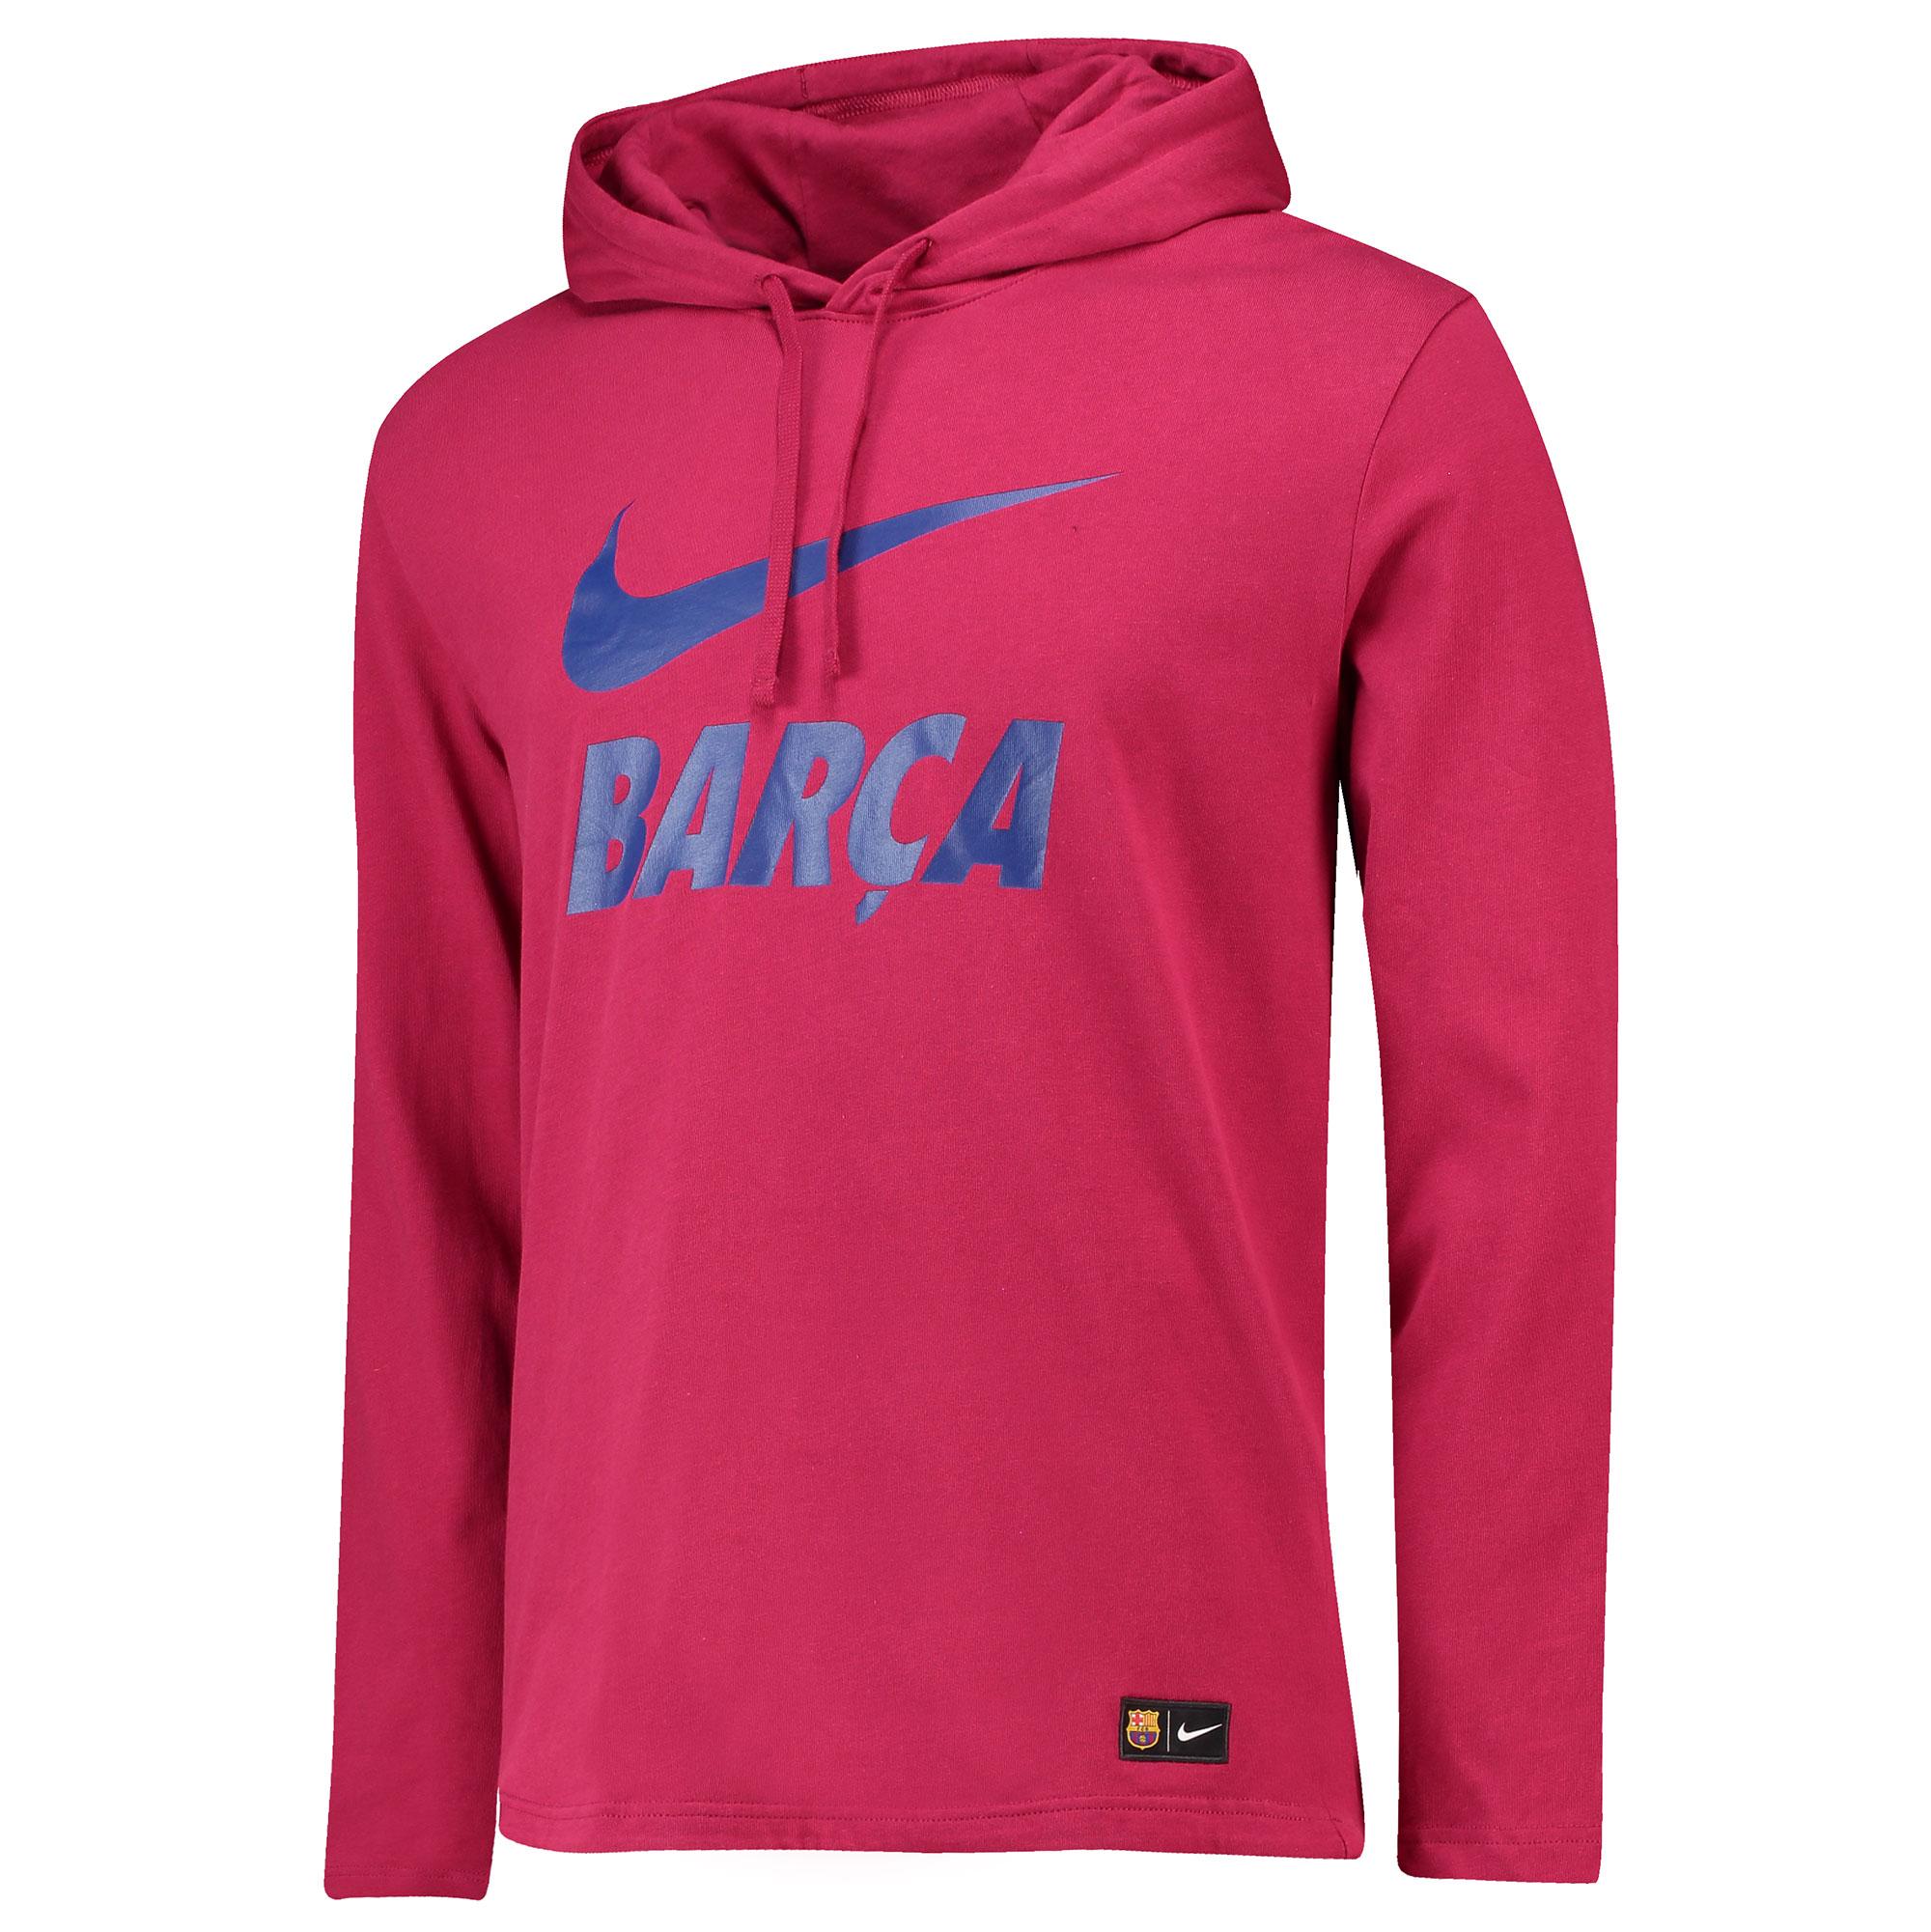 Nike FC Barcelona mikina červená pánska 4ac06b06240